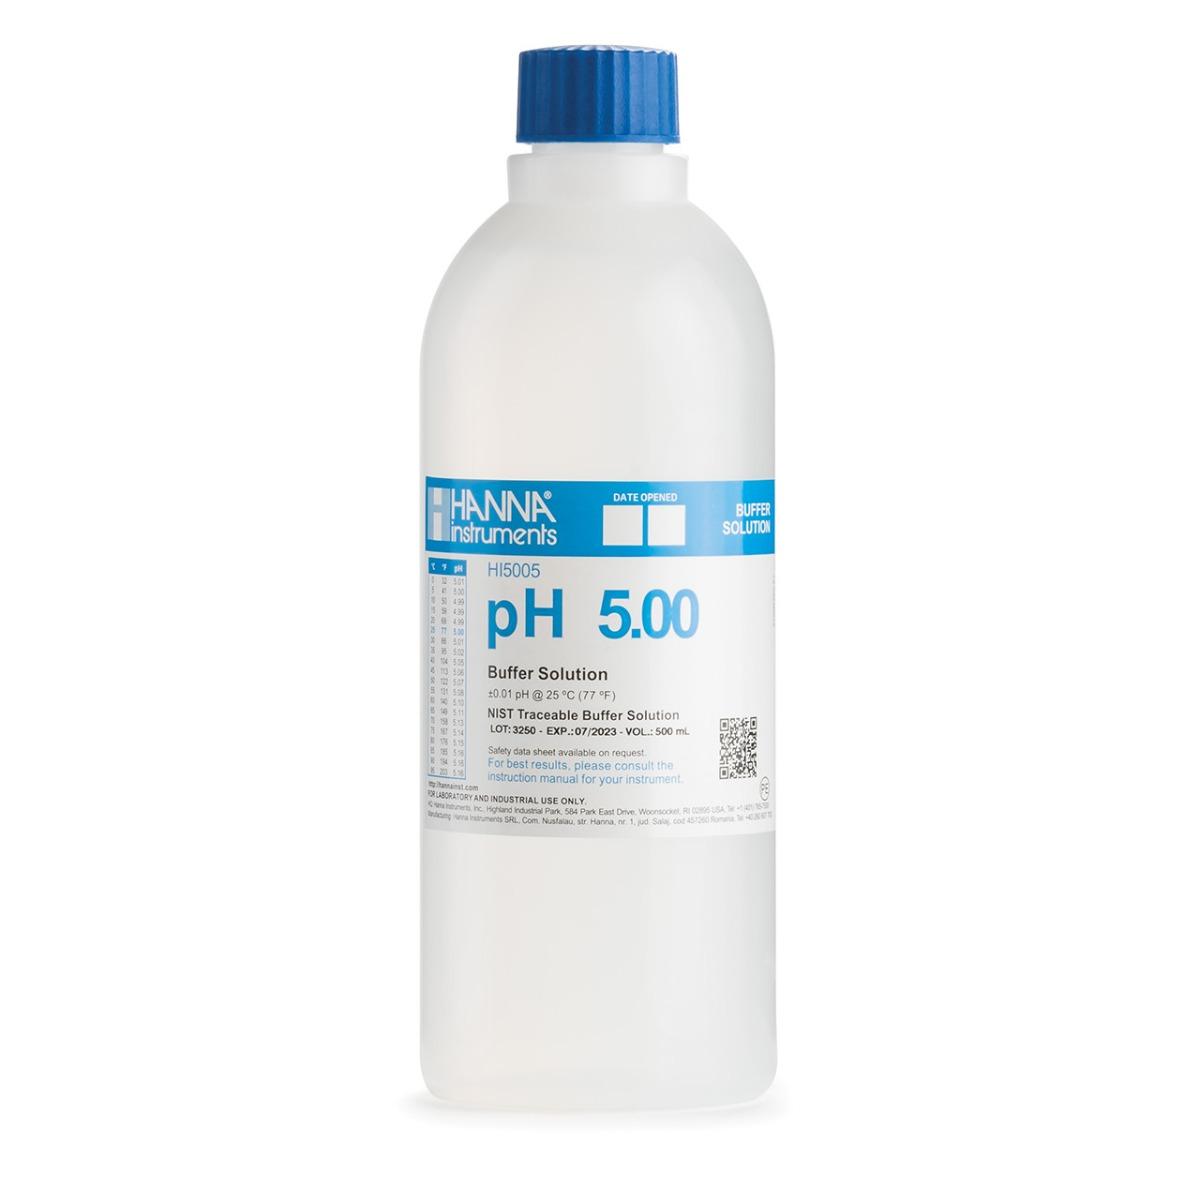 HI5005-01 pH 5.00 Technical Calibration Buffer (1 L)